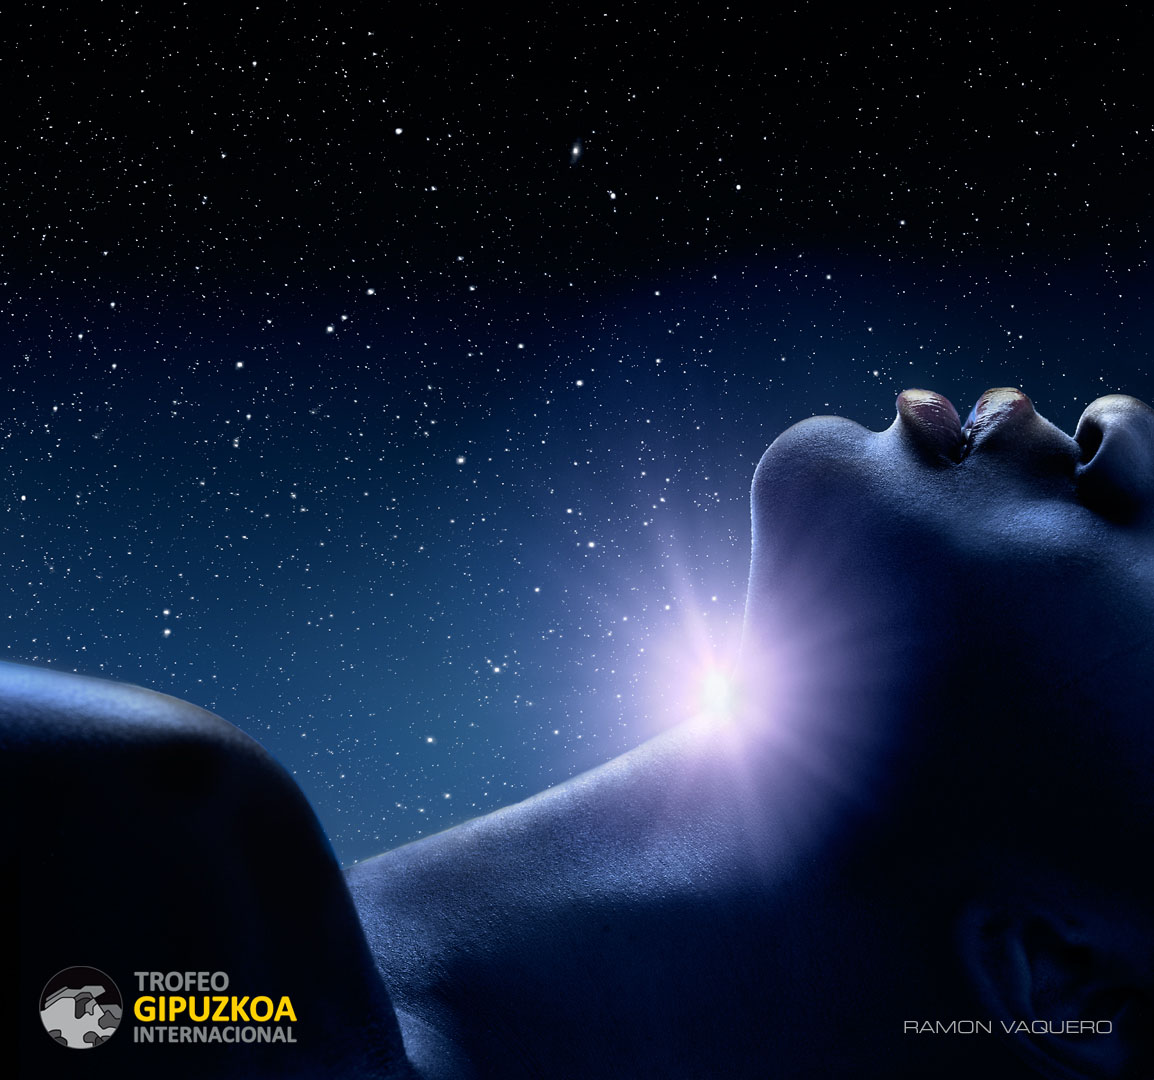 Stars-Time_ramon-vaquero_trofeo -GIPUZKOA